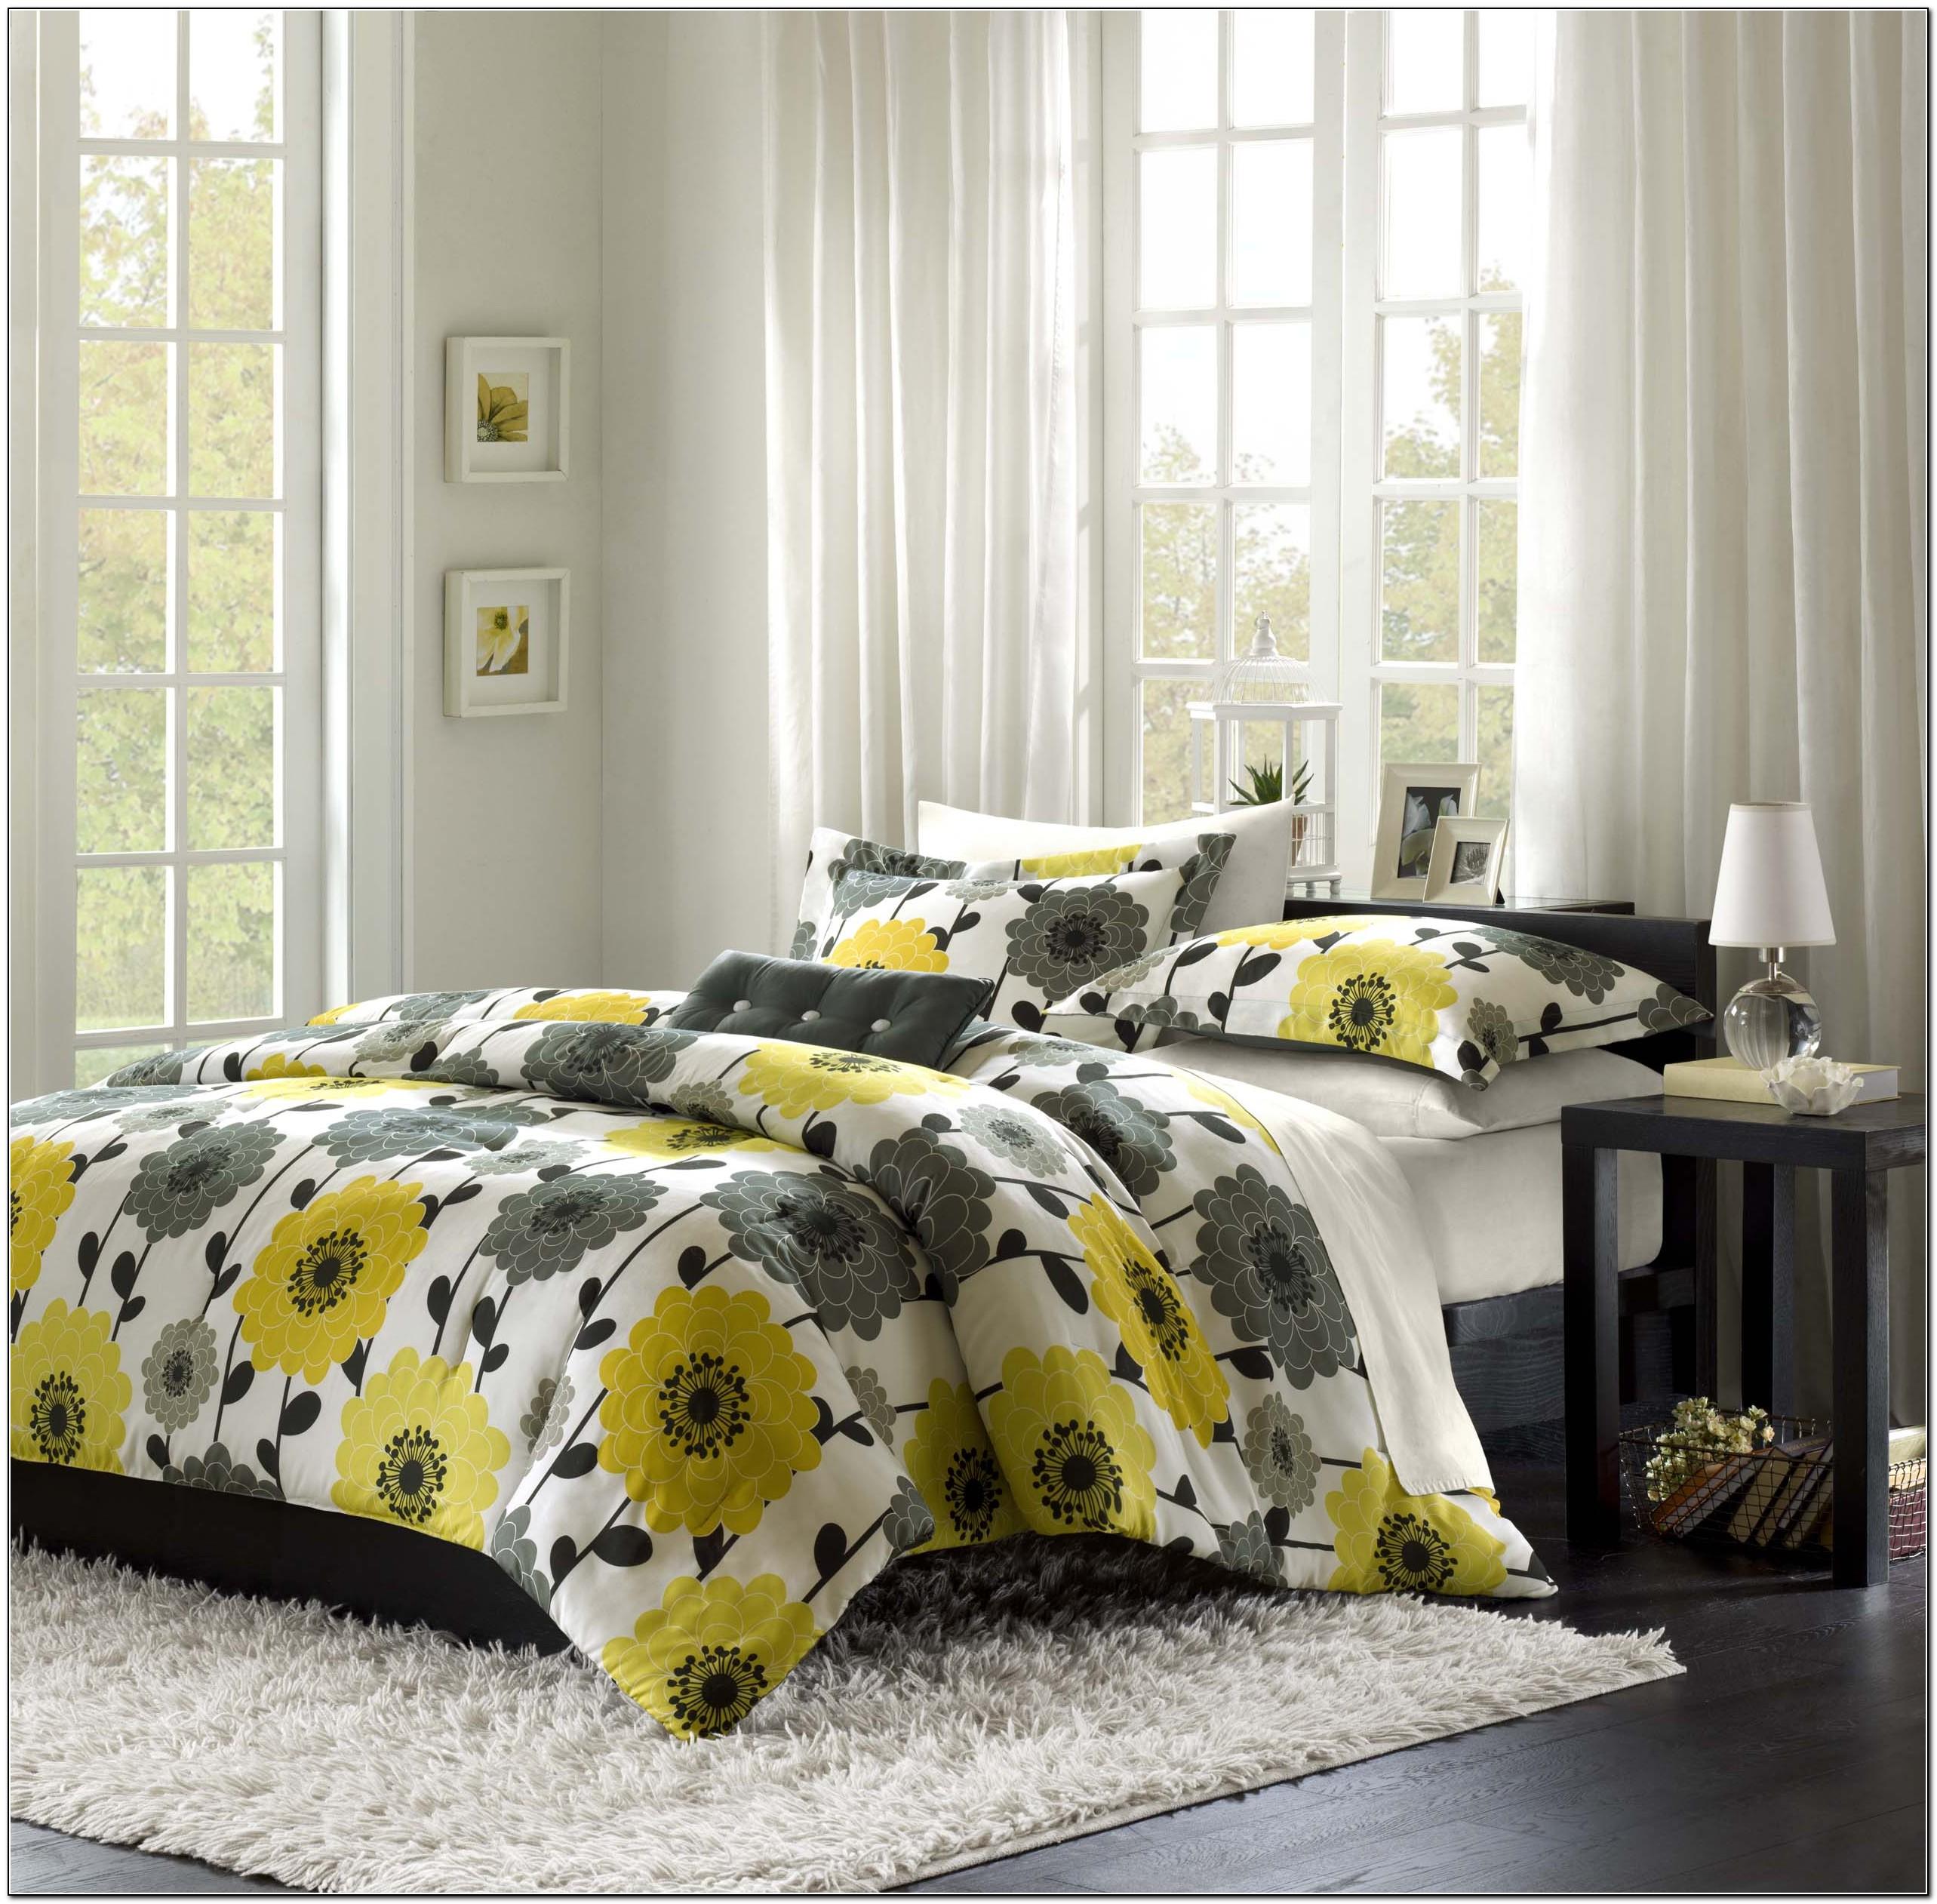 Yellow And Grey Bedding Kohl's